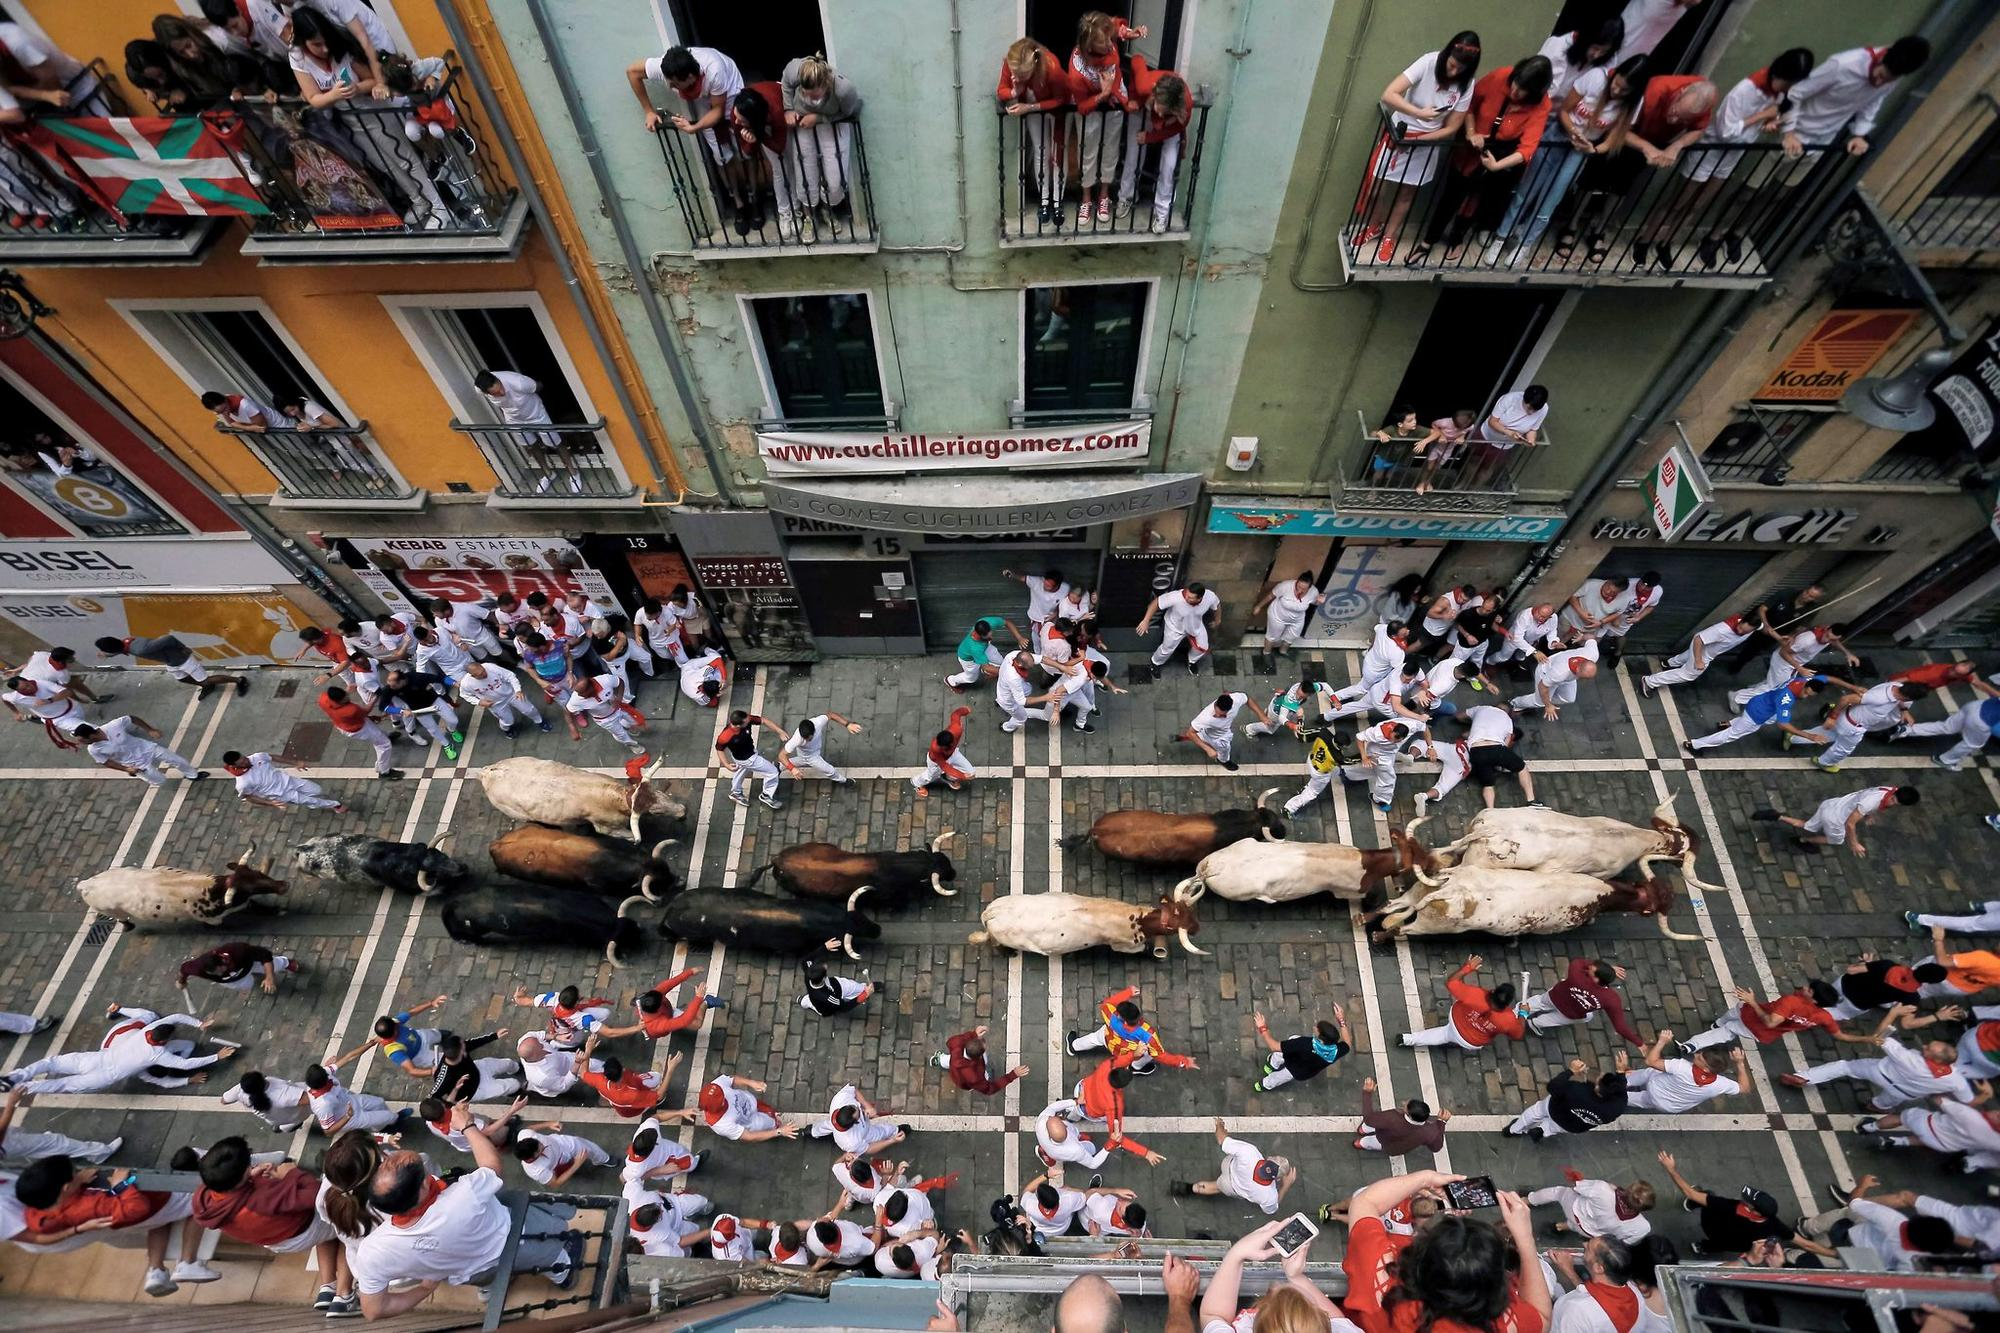 Second bullrun of Sanfermines, Pamplona, Spain - 08 Jul 2019